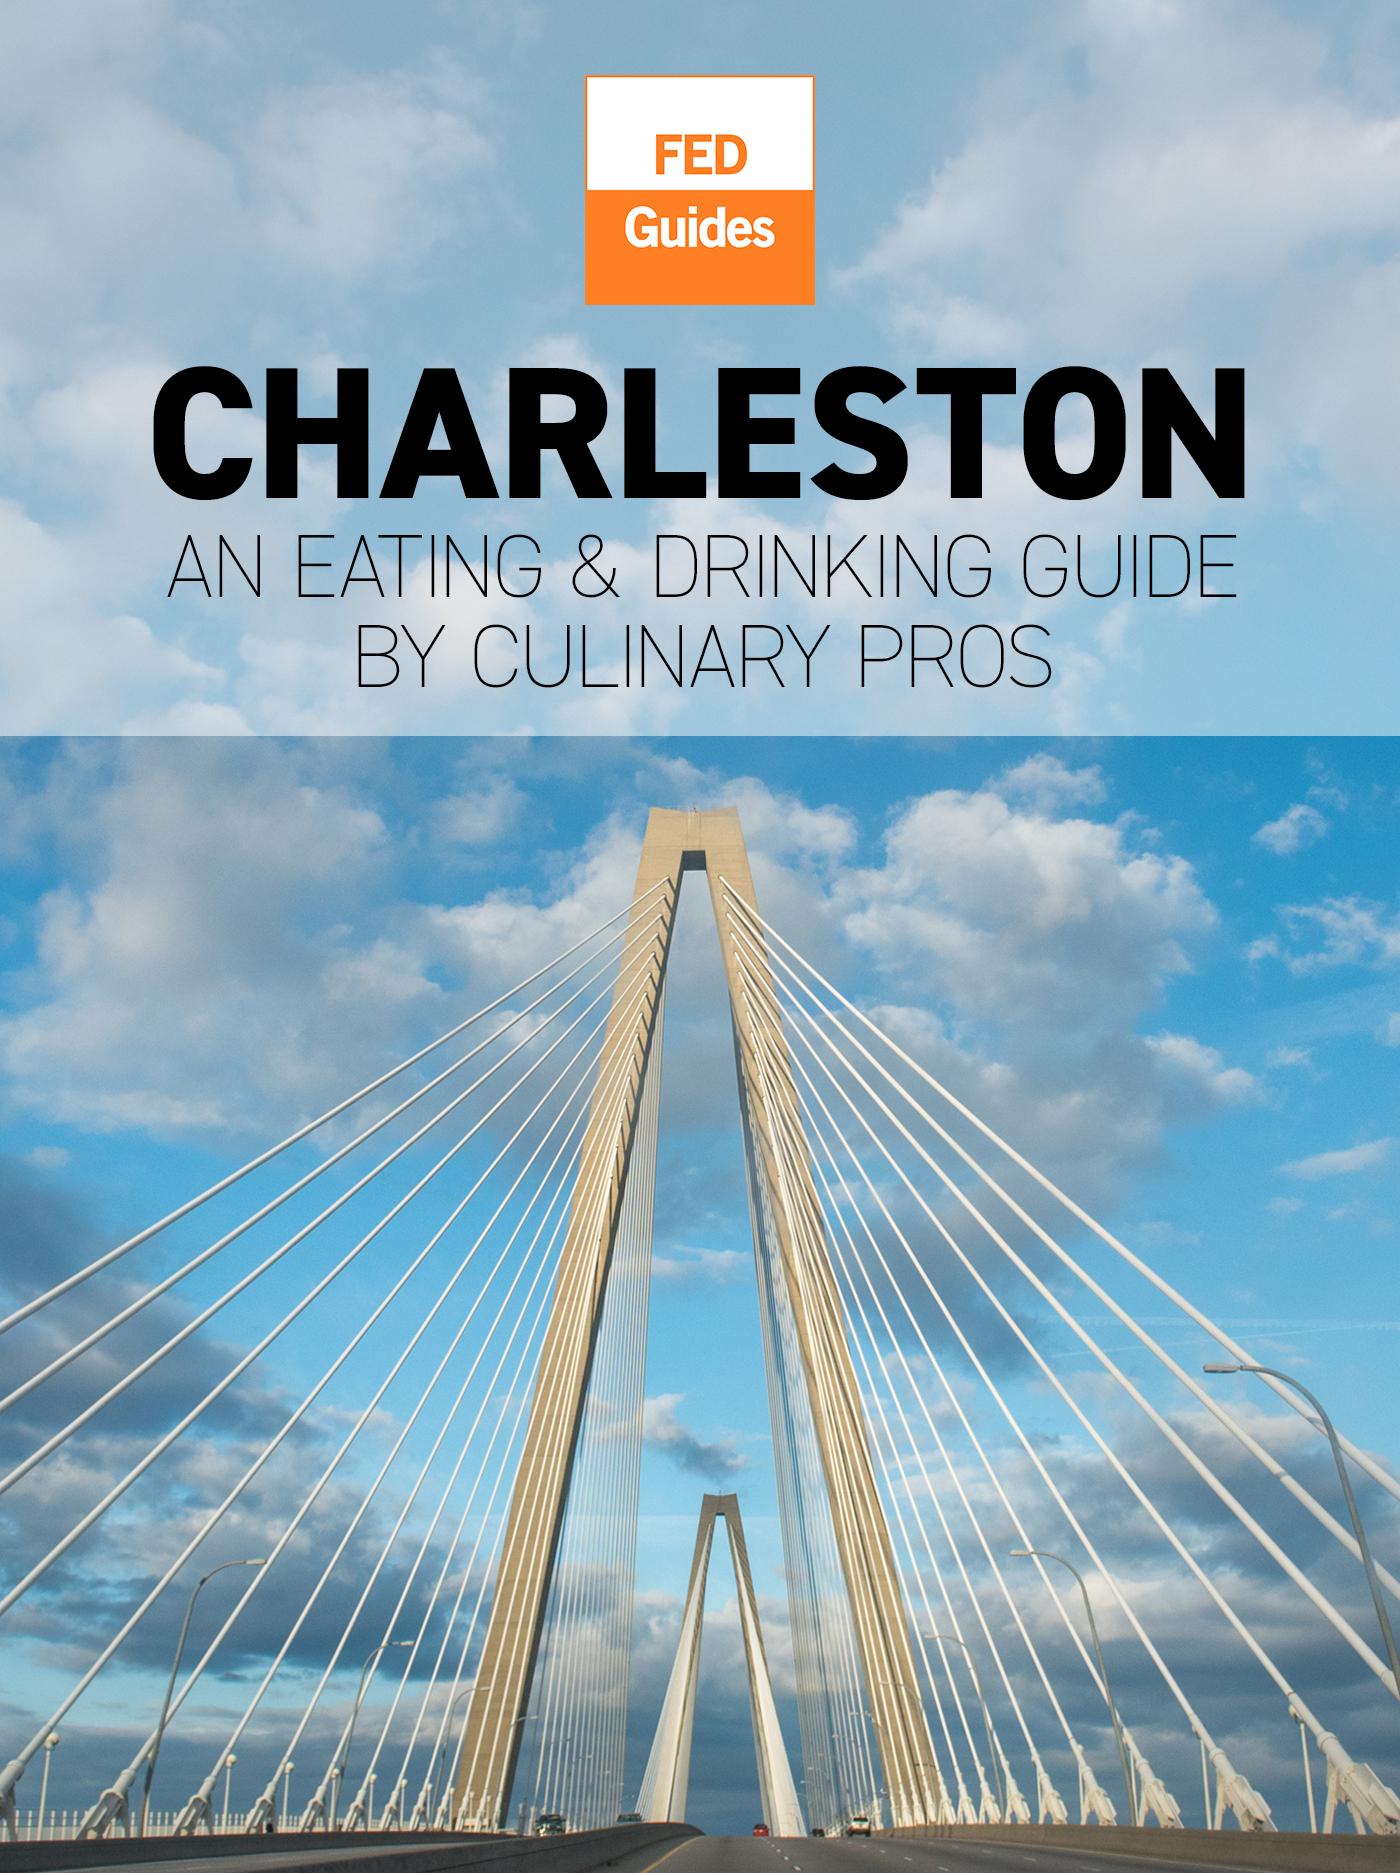 USA_FL_Charleston_eBook_Apple_Cover_v1.2.jpg